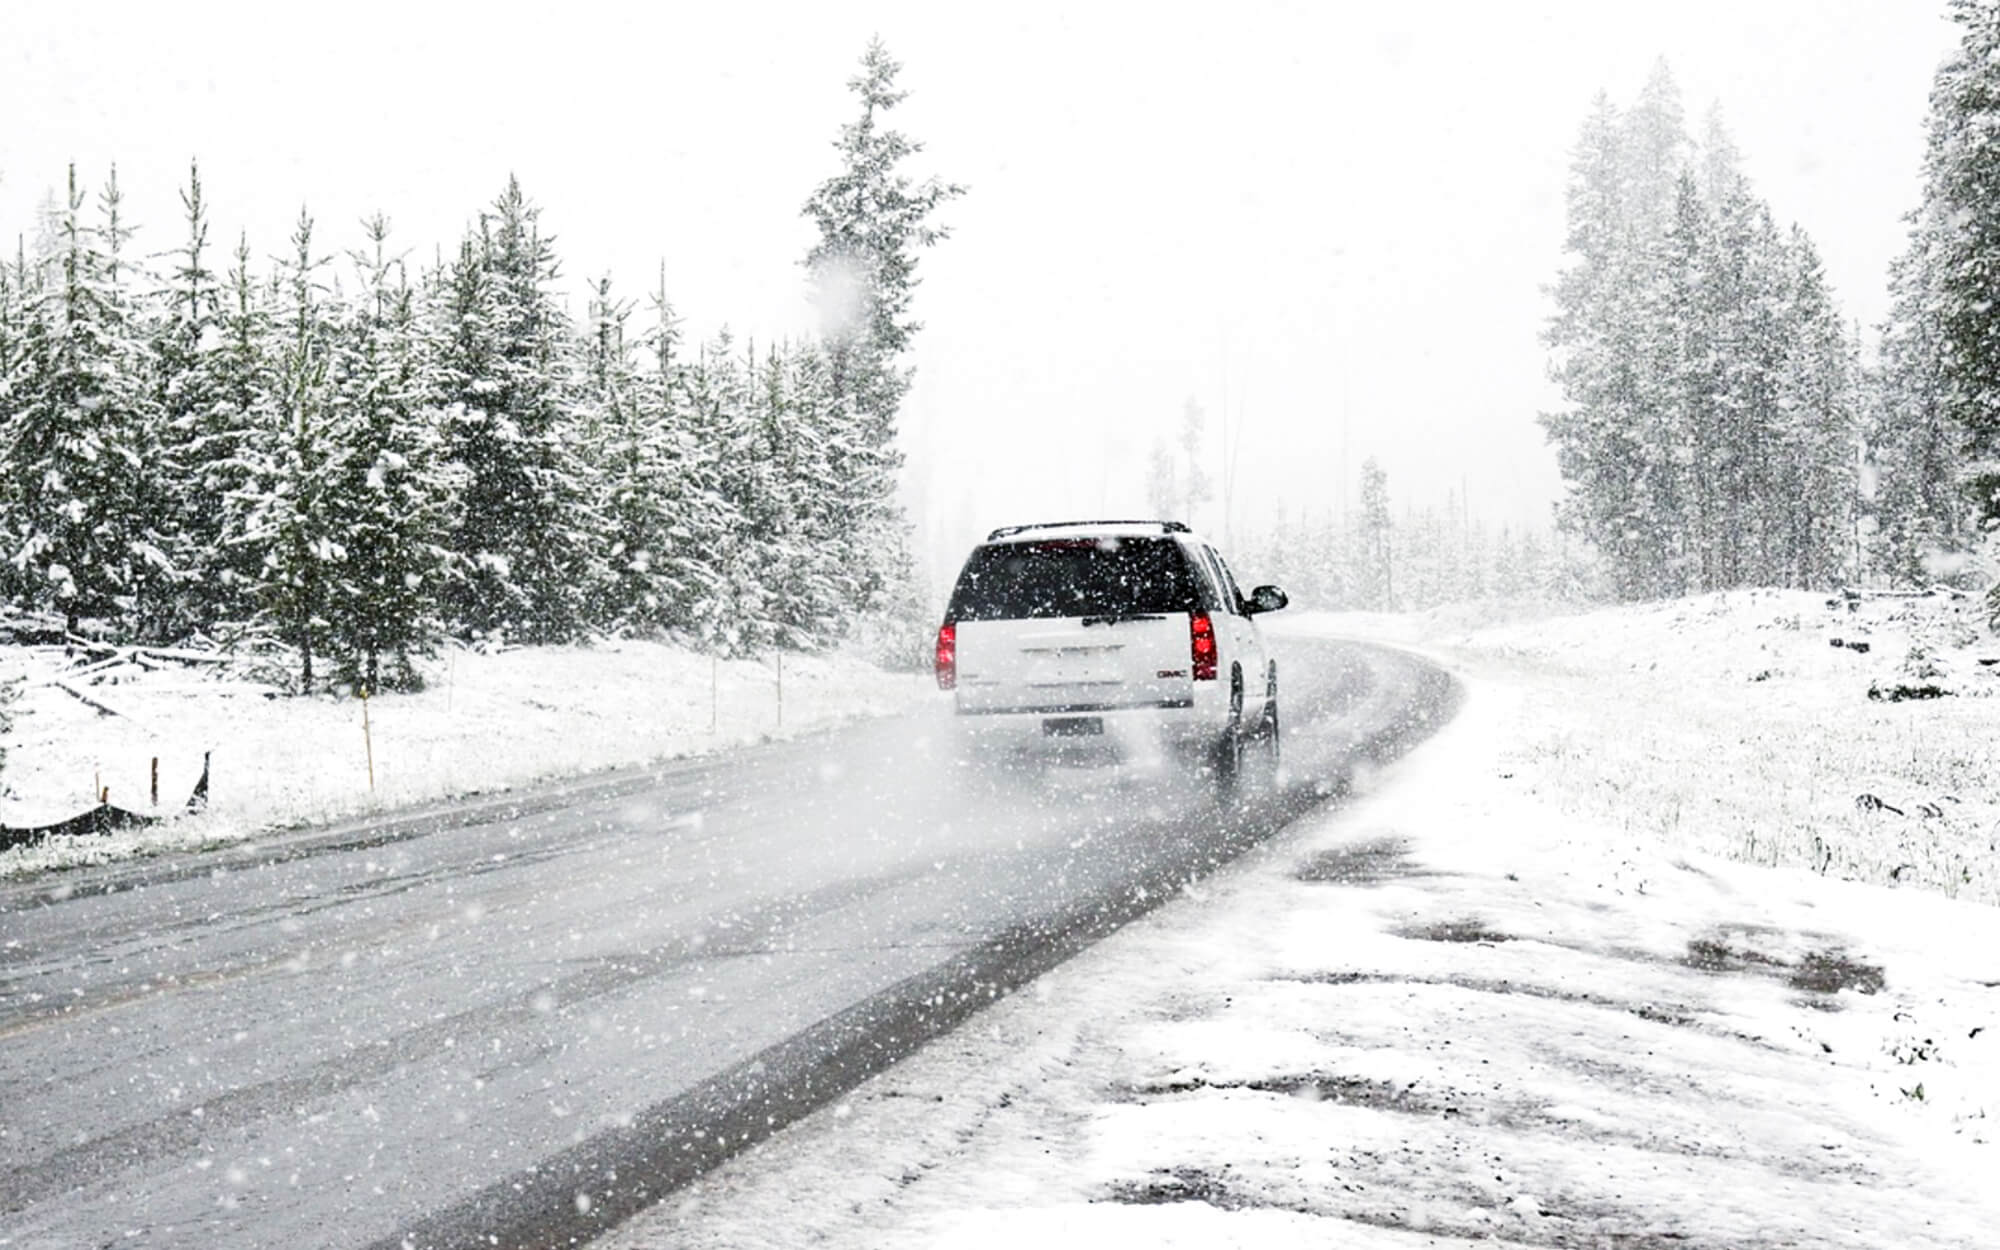 Hiver route neige verglas voiture